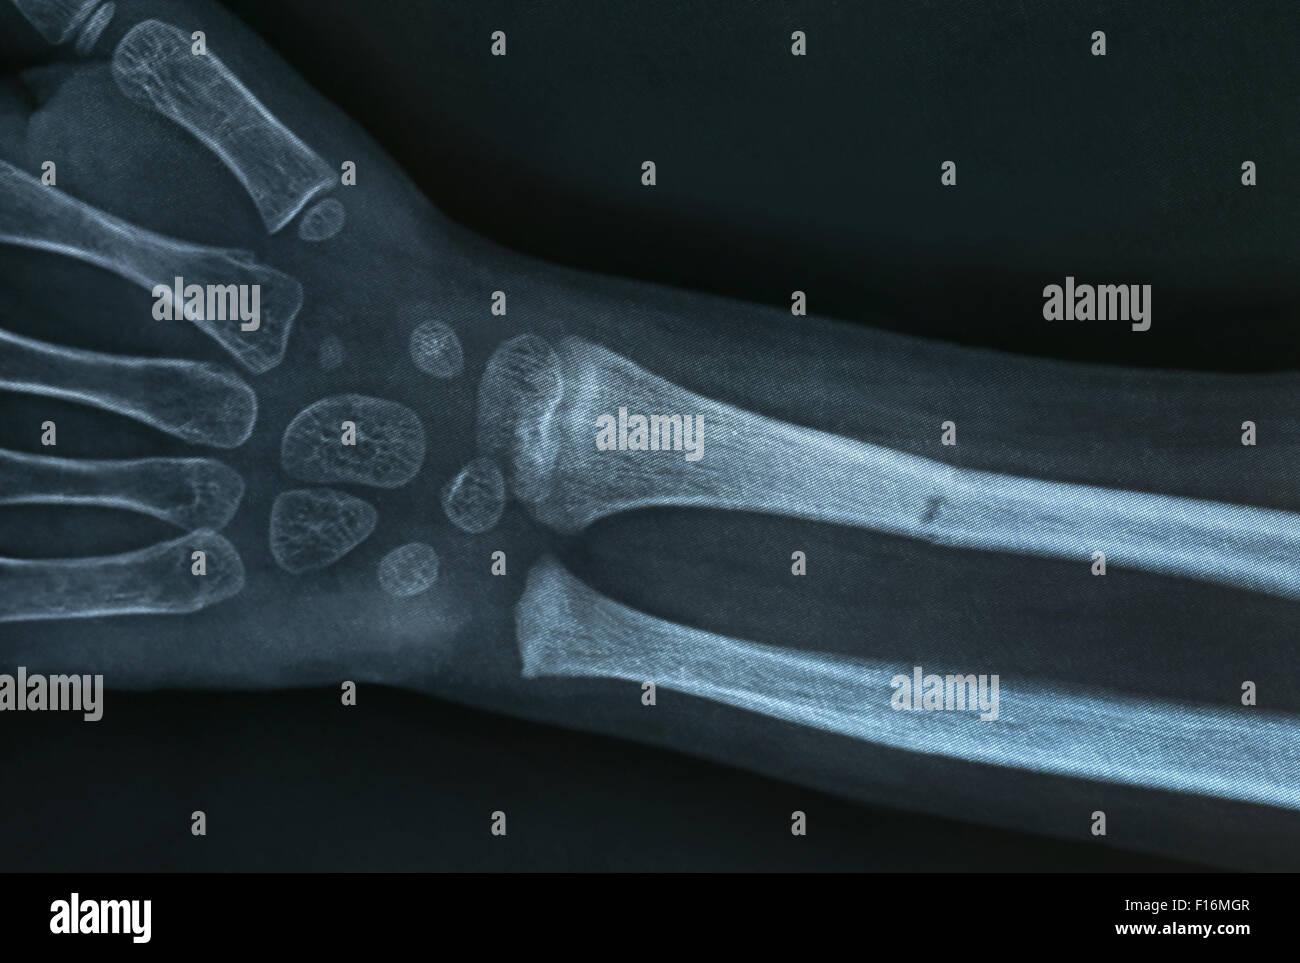 Close up of a brokan hand Xray - Stock Image